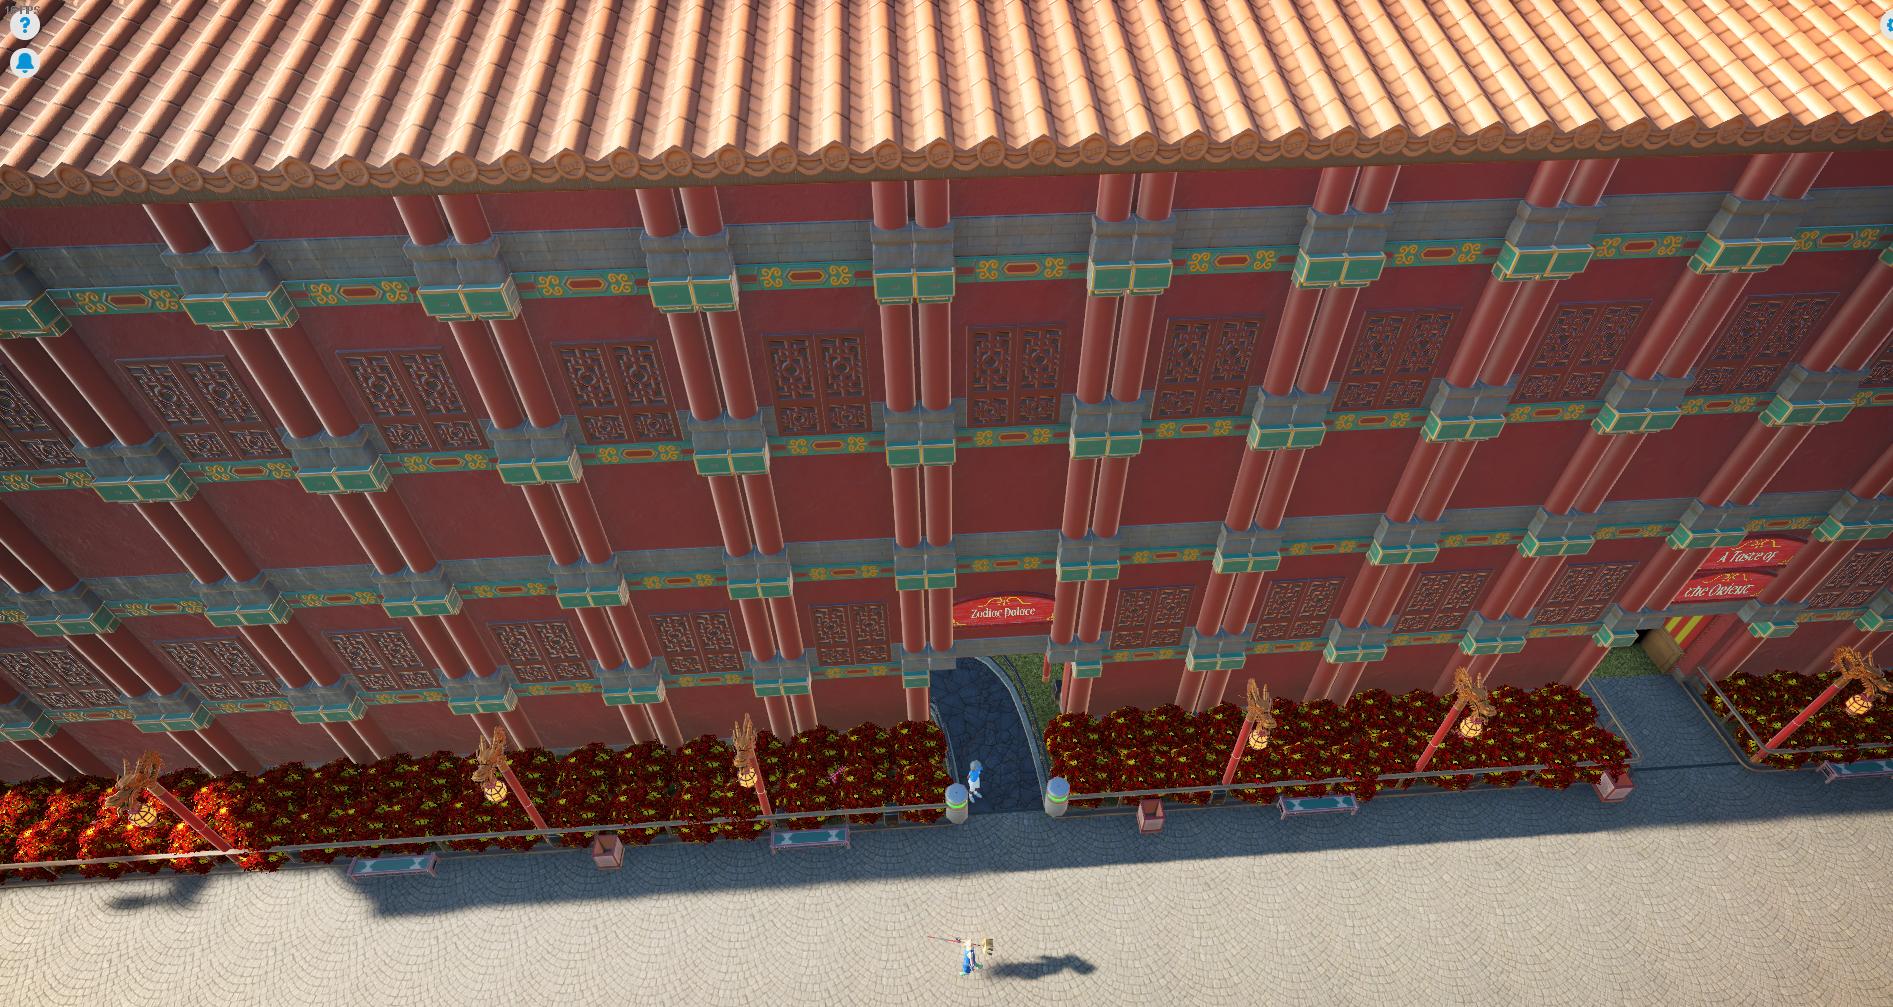 Zodiac-Palace-Building-Exterior.png